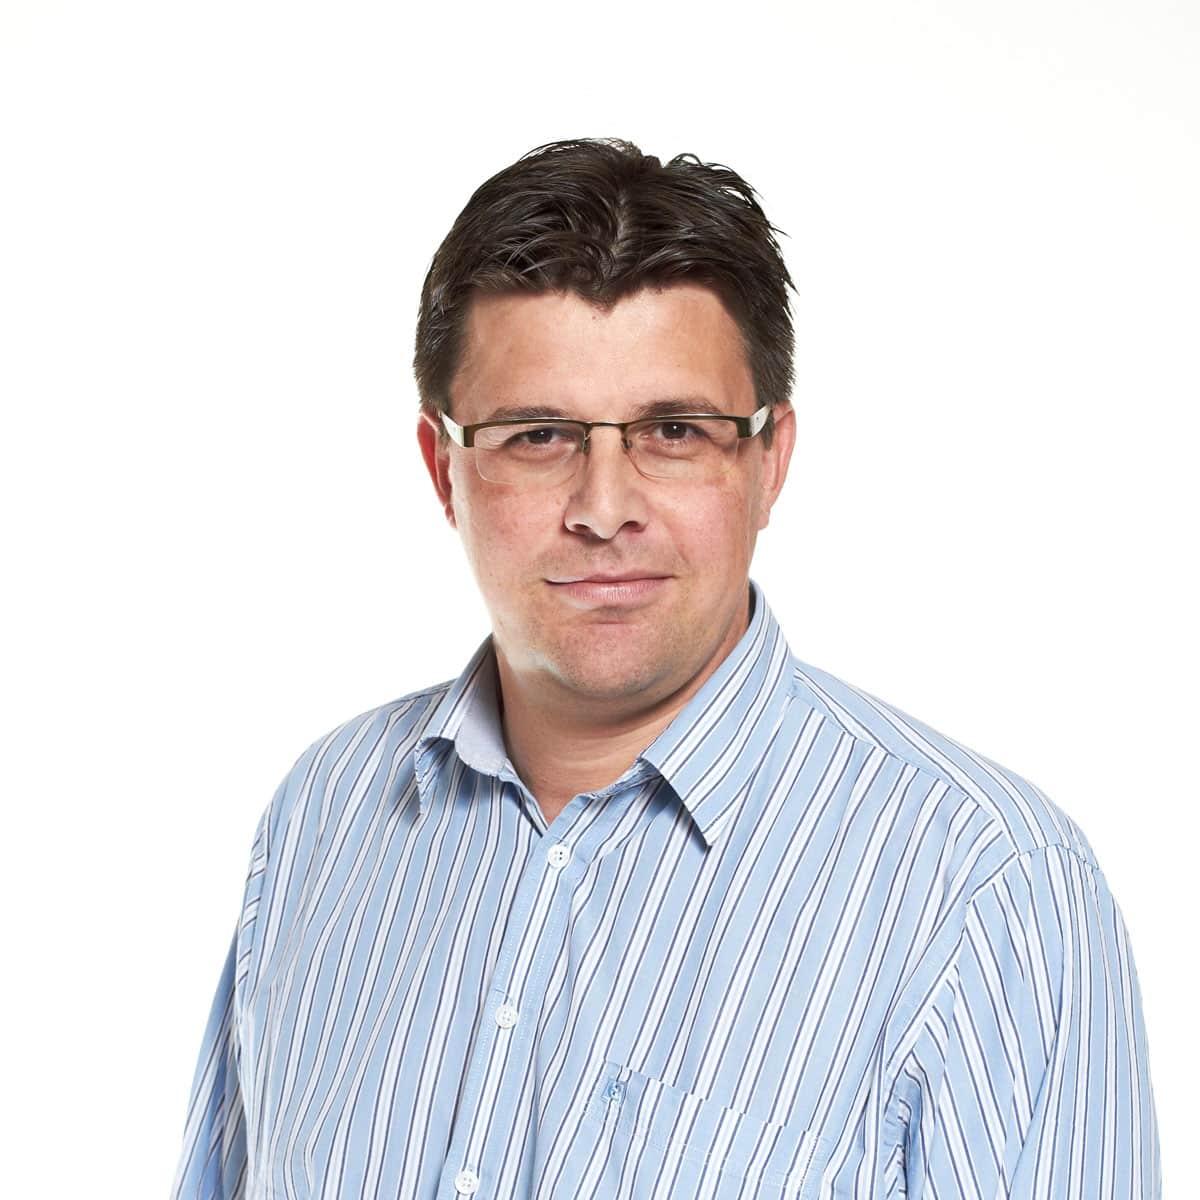 Roland Oth Gründer igumbi.com (Portrait)